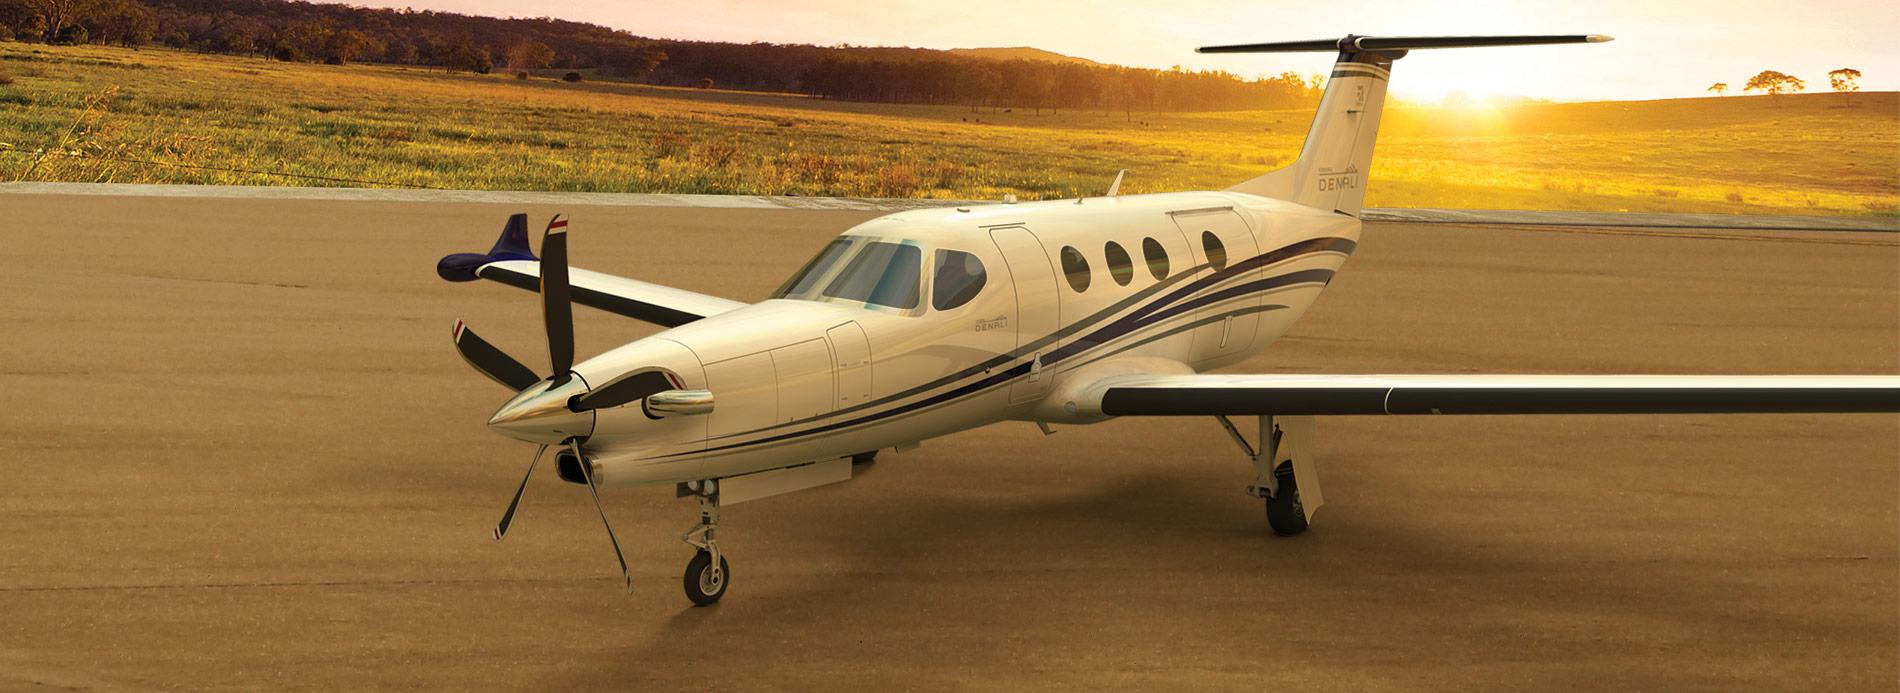 denali-aircraft-in-field